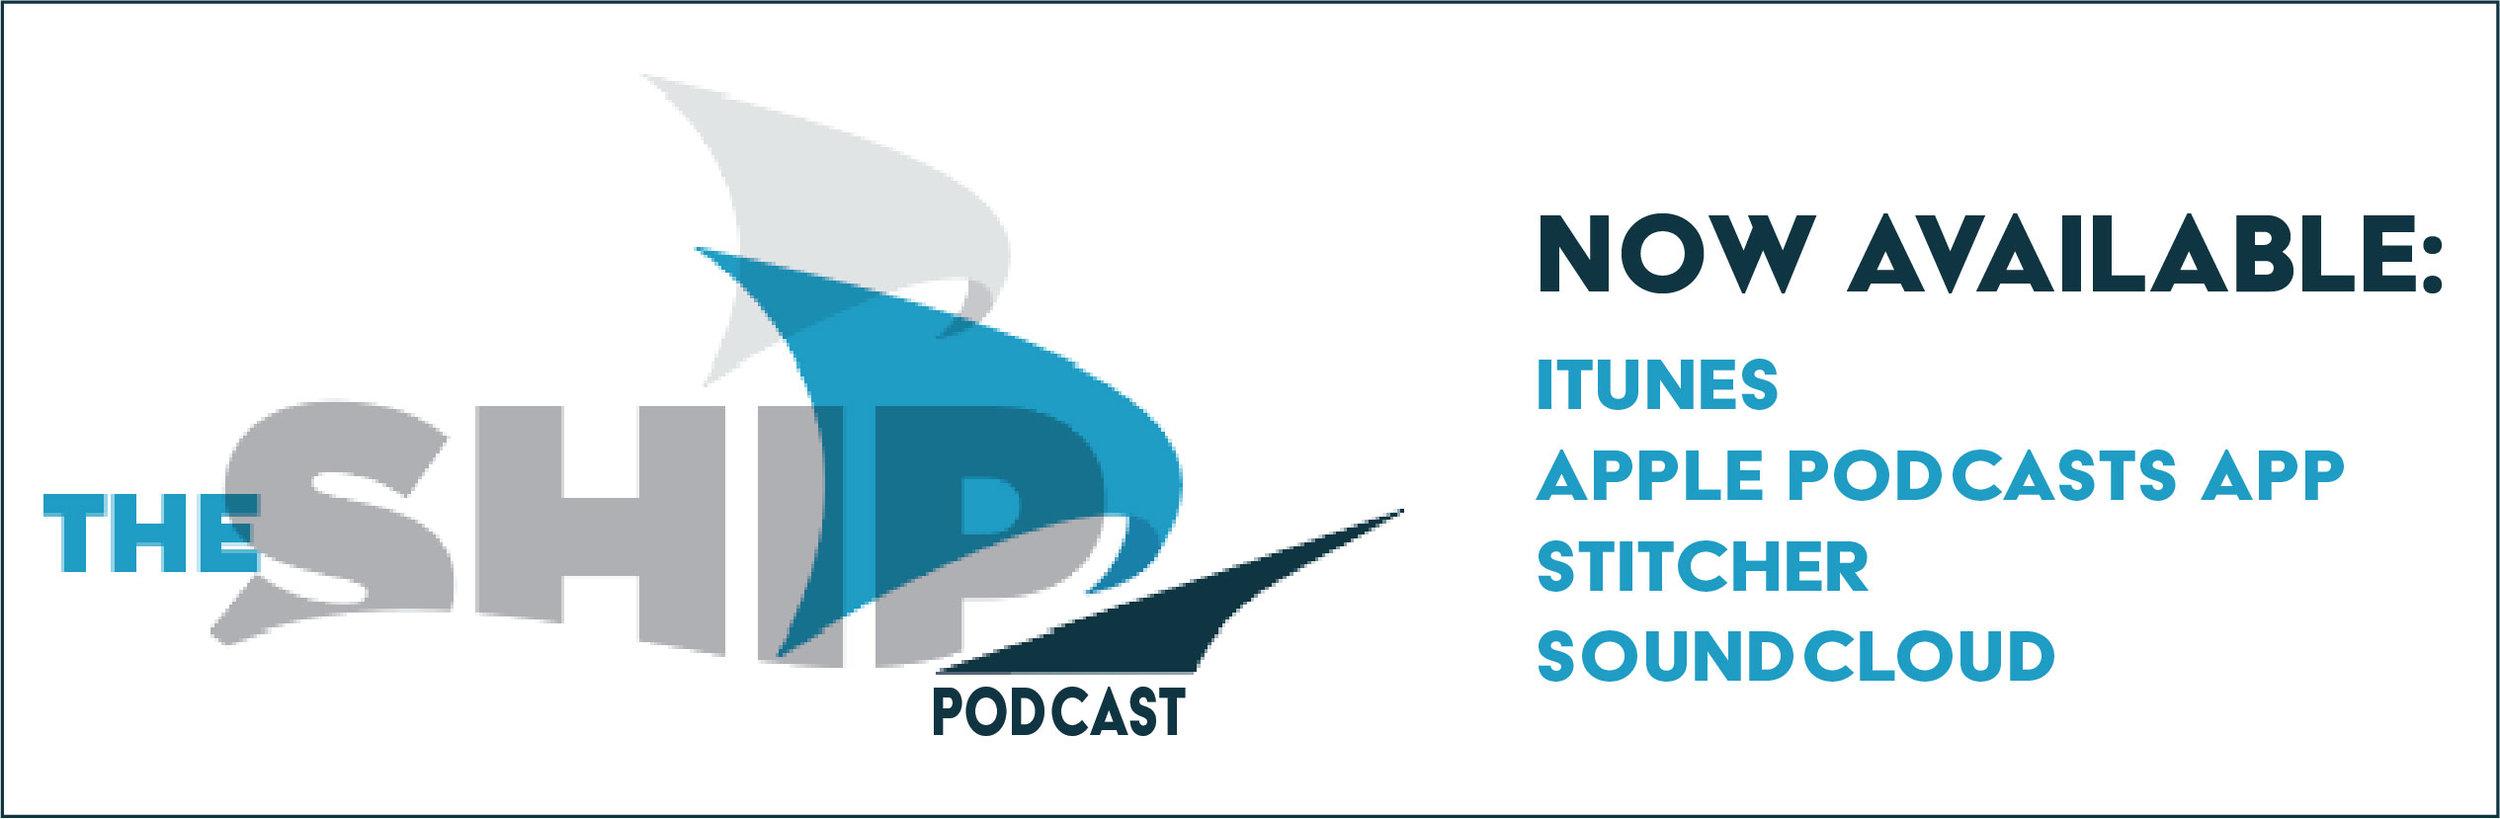 Ship Podcast Blog Image 7.jpg